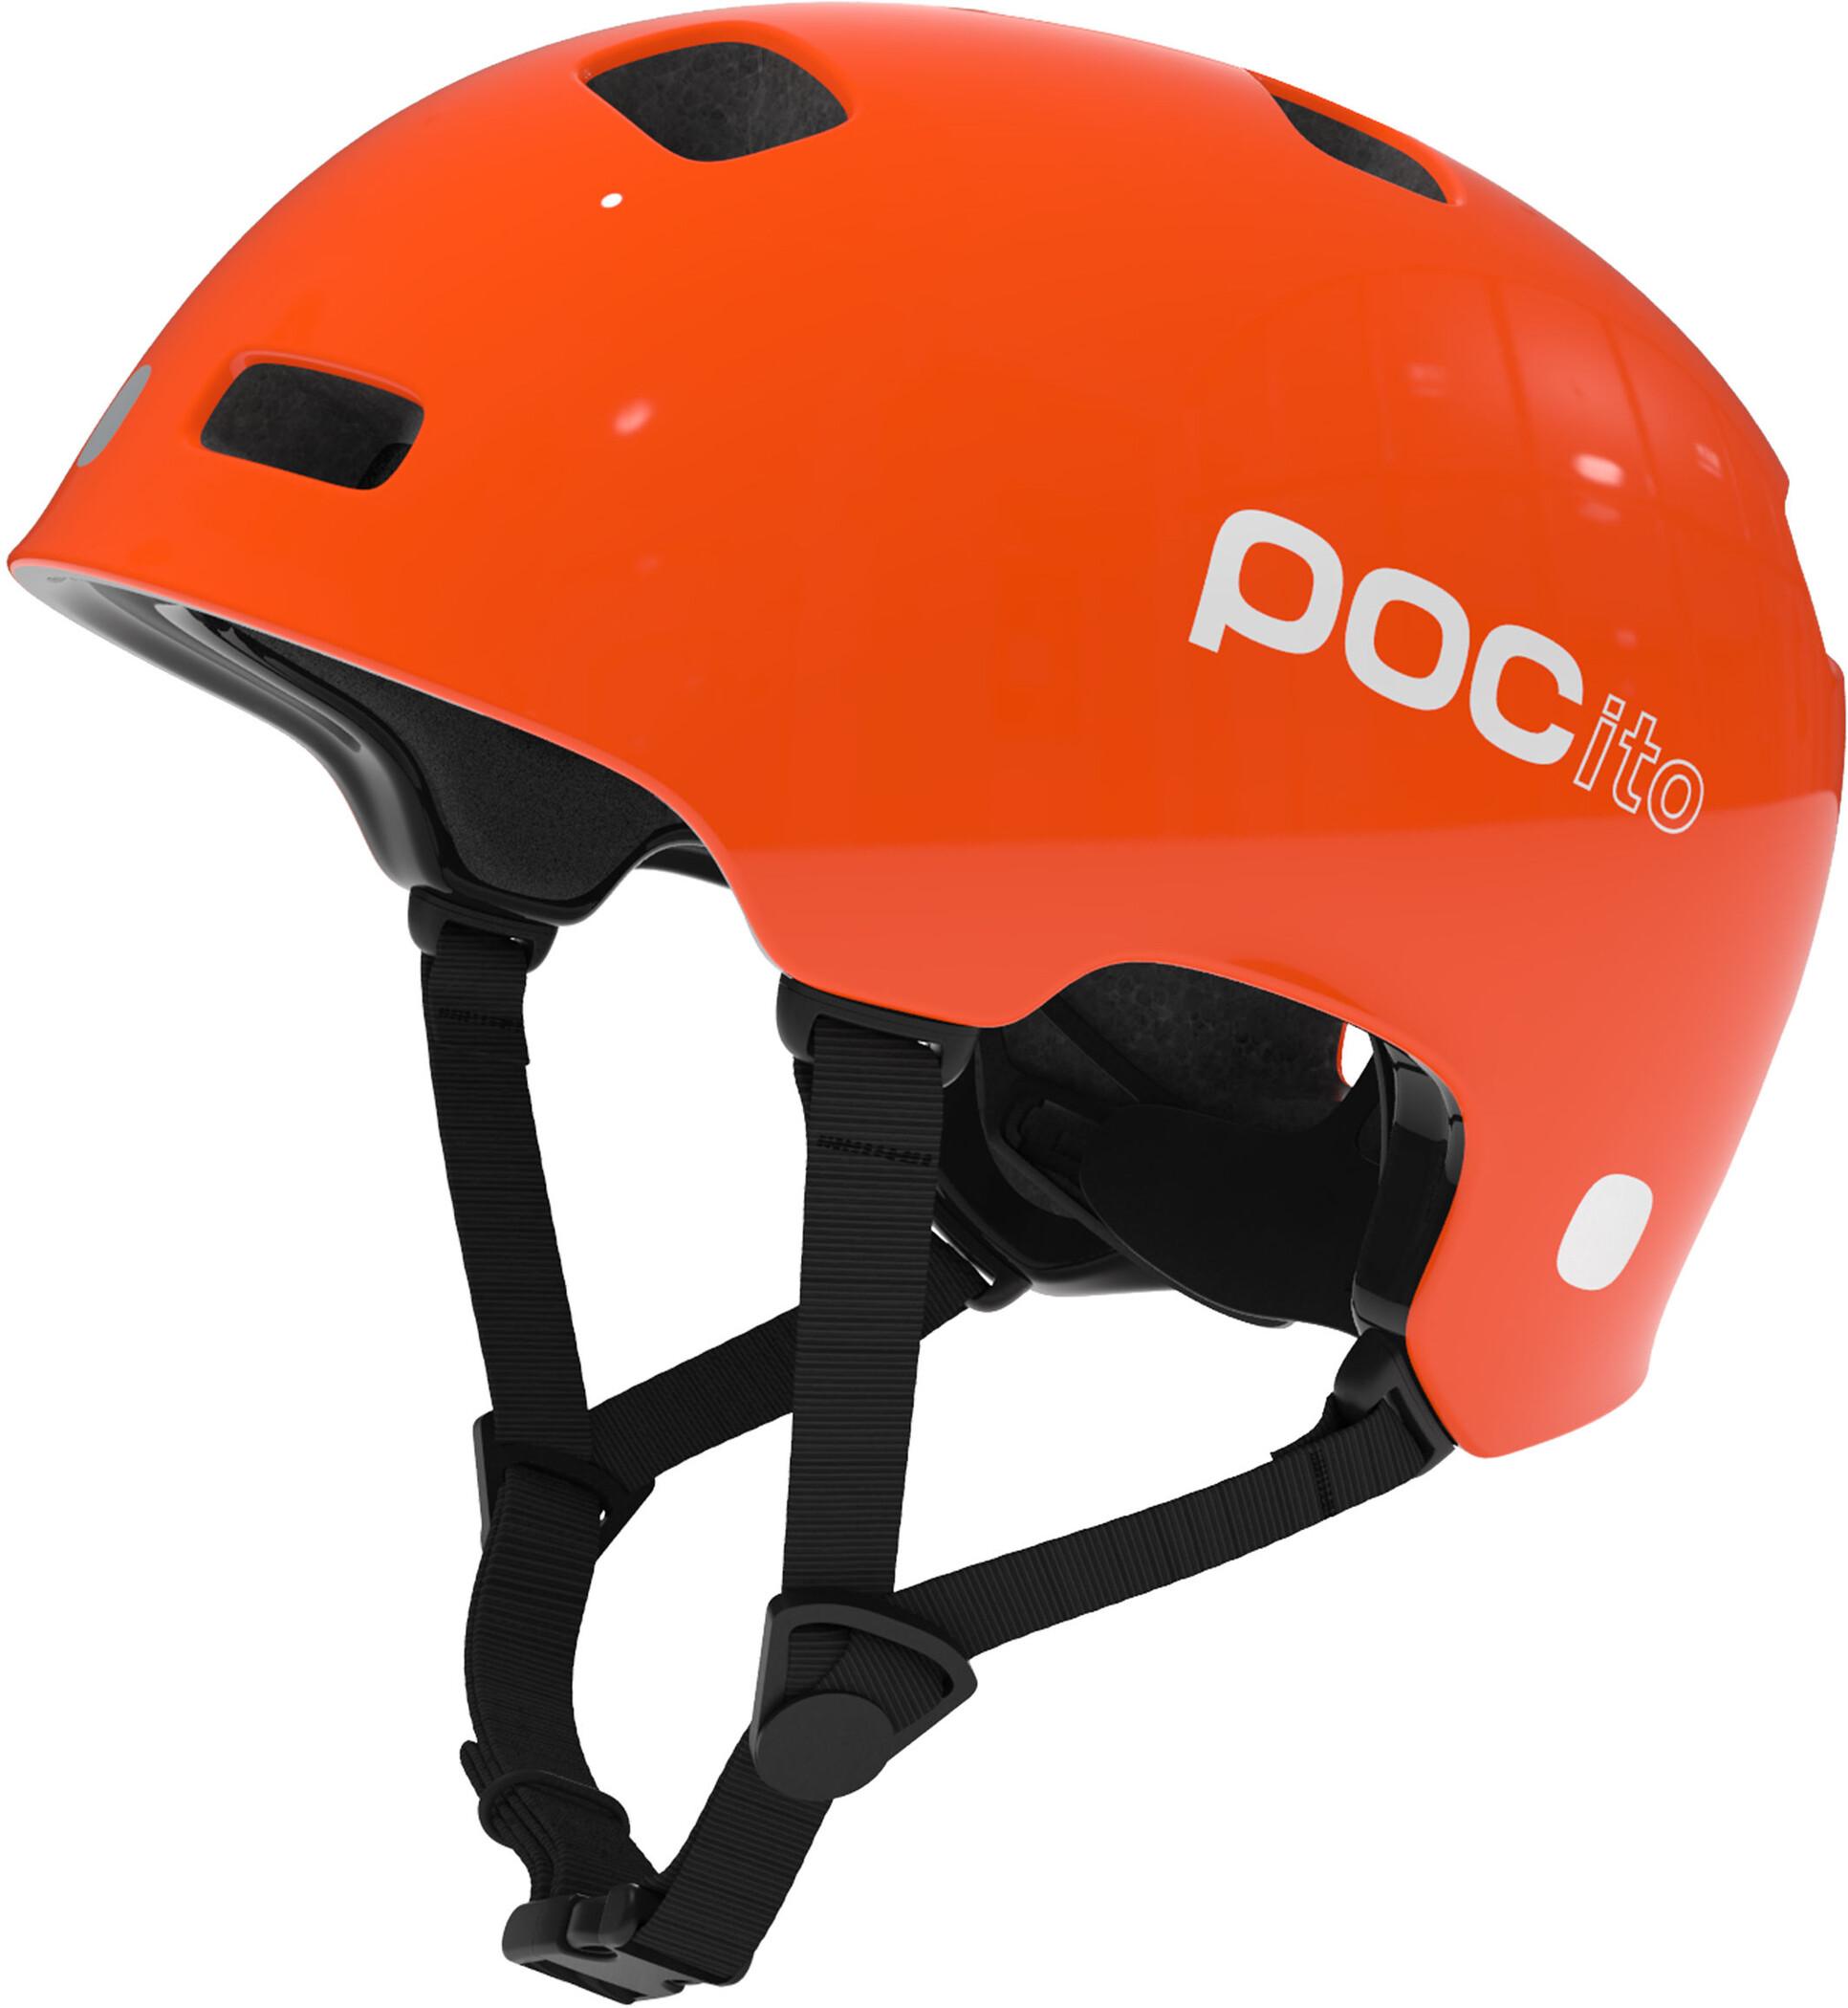 POC POCito Crane Cykelhjelm Børn, pocito orange (2020) | Helmets